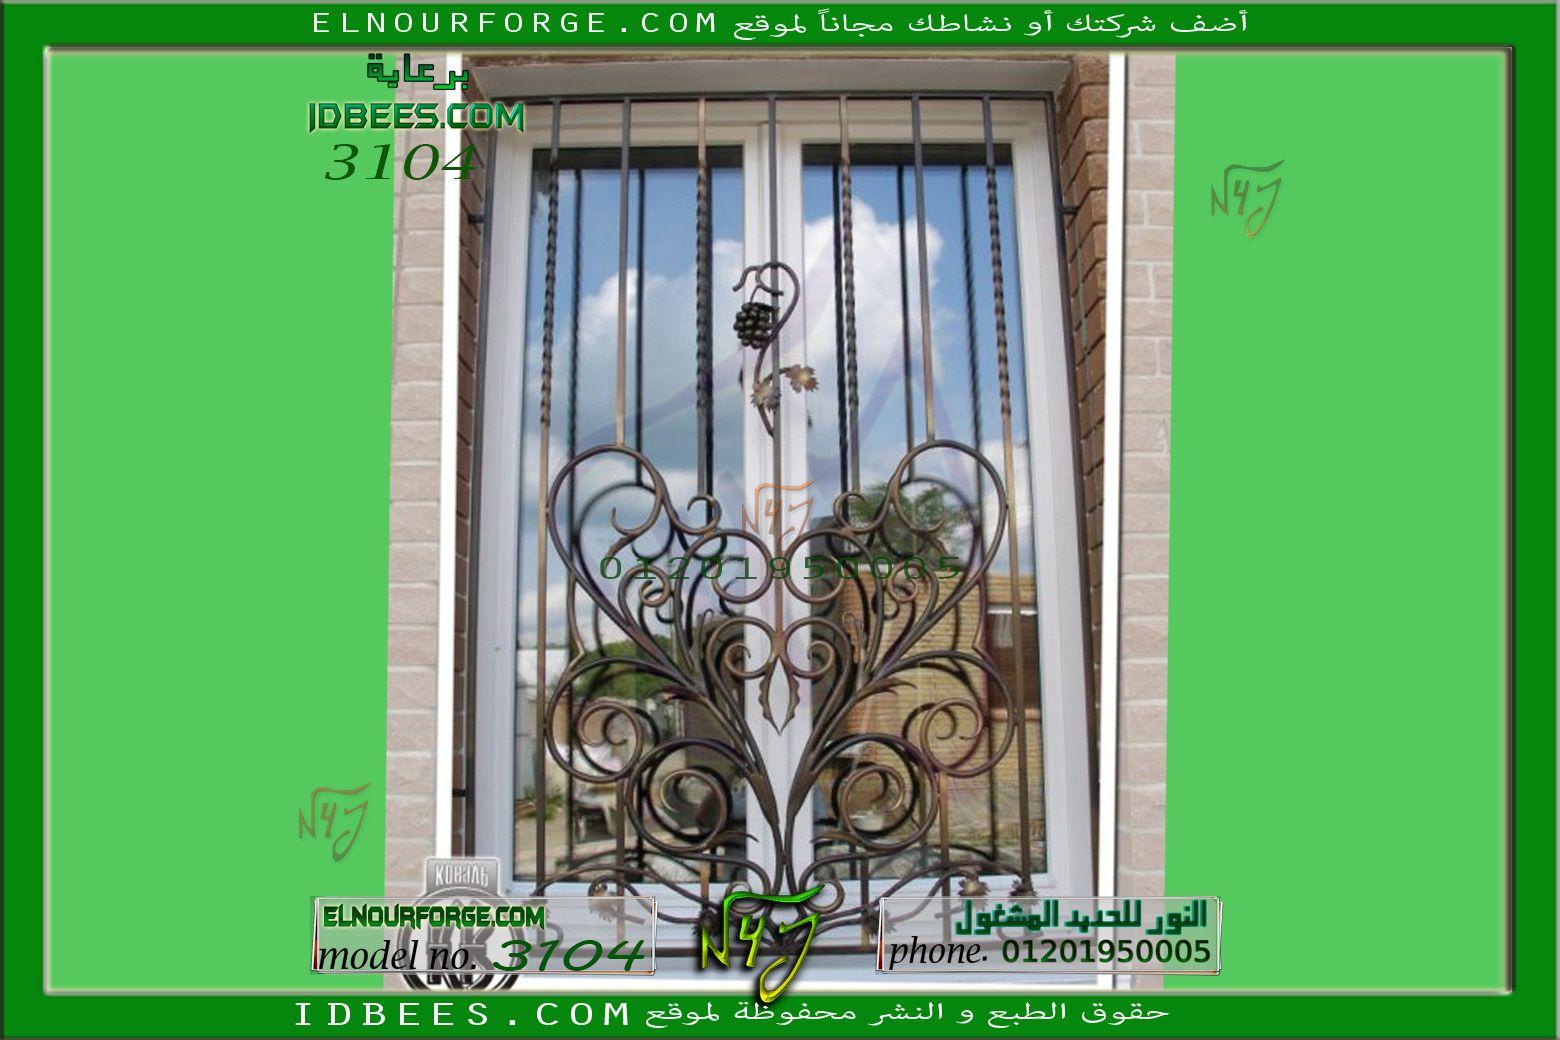 3104 Window Wrought Iron نوافذ شبابيك حديد مشغول